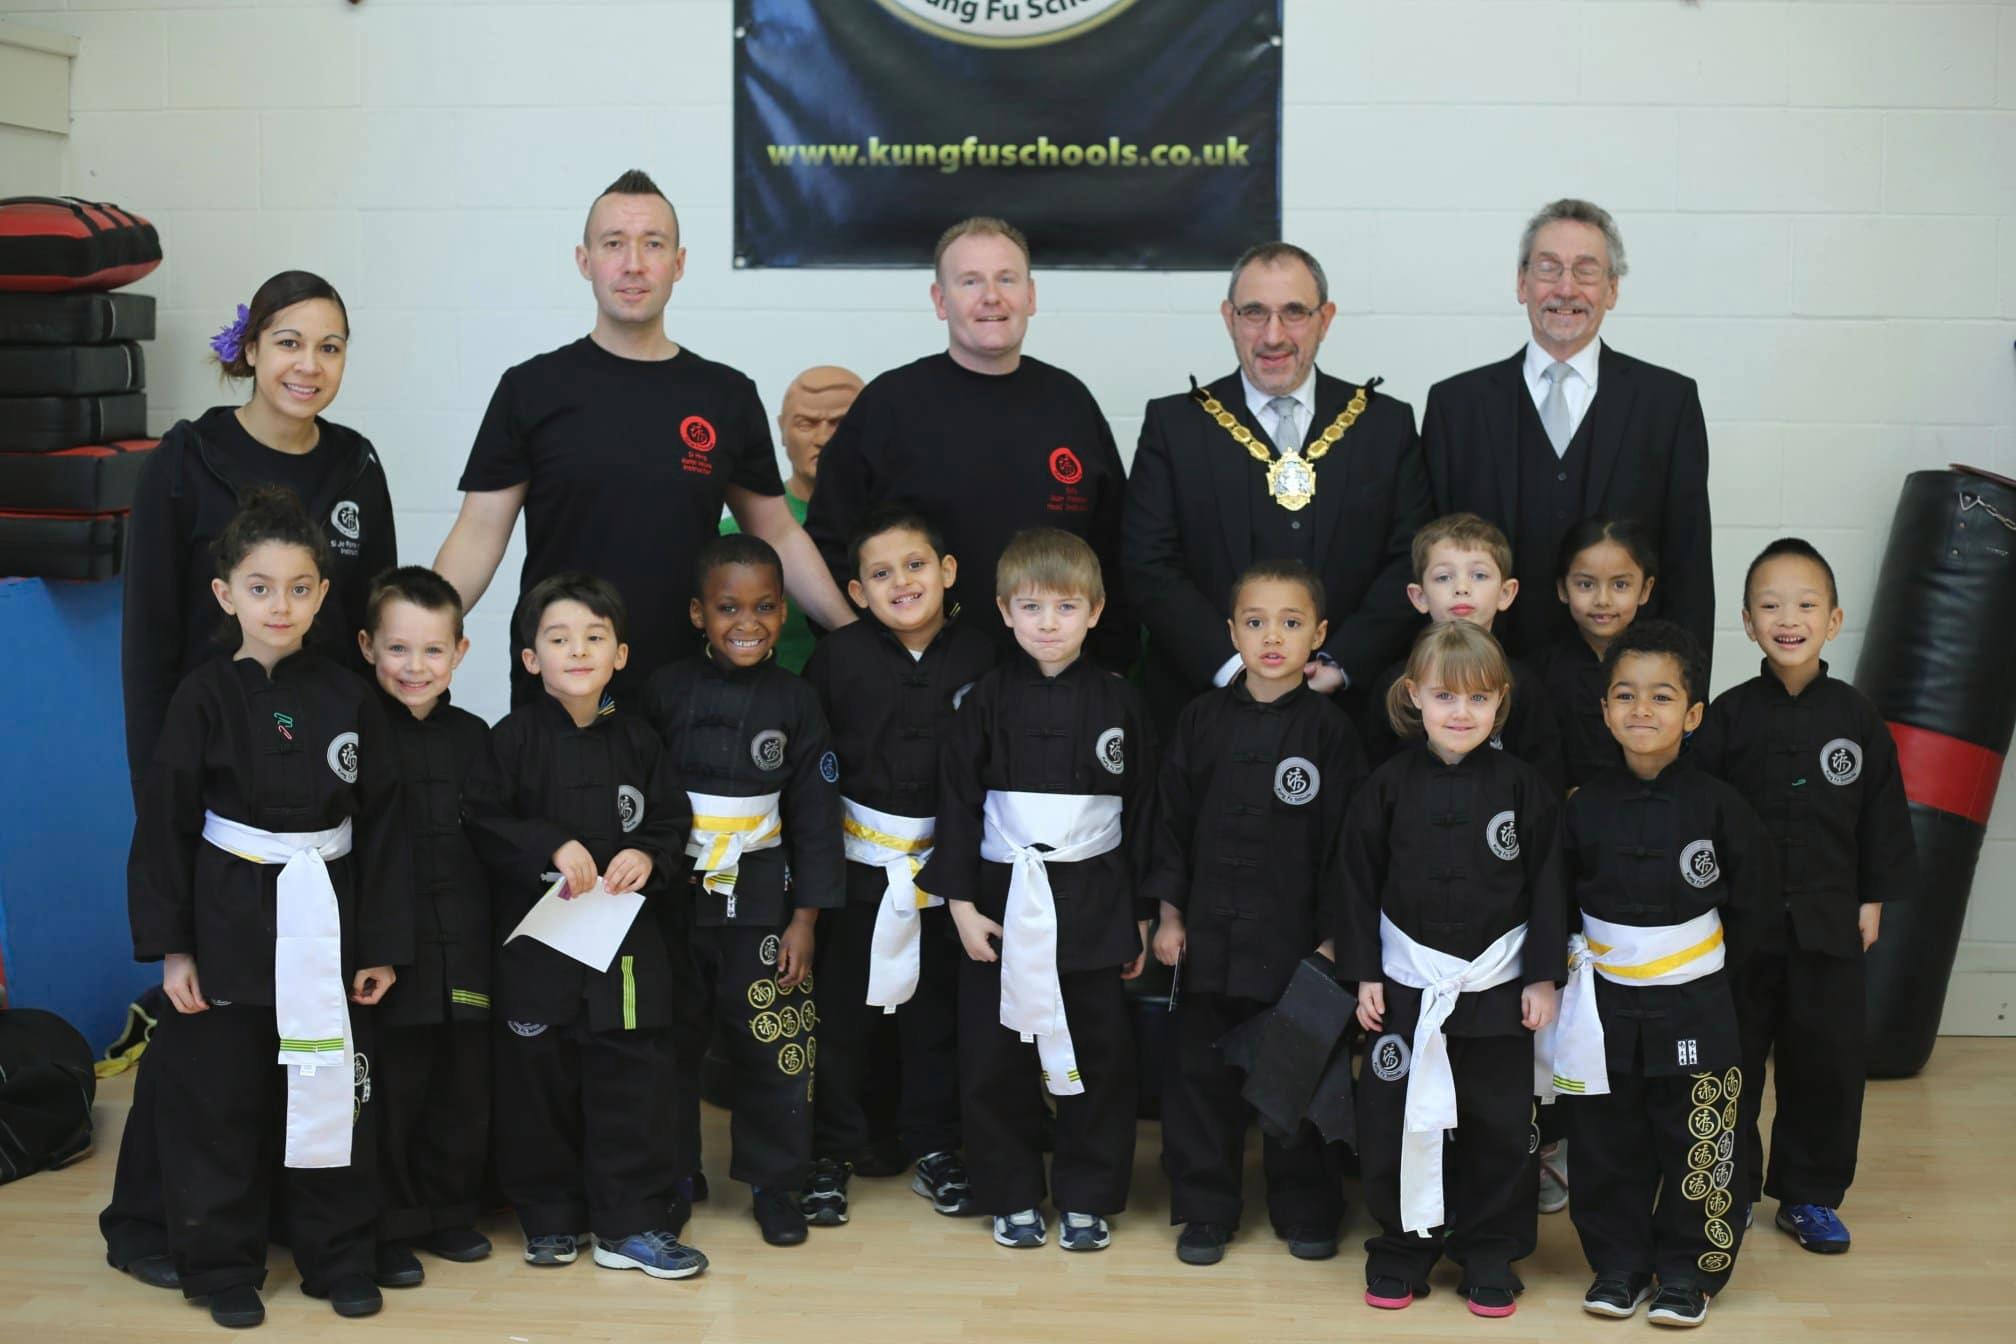 Kungfu Schools